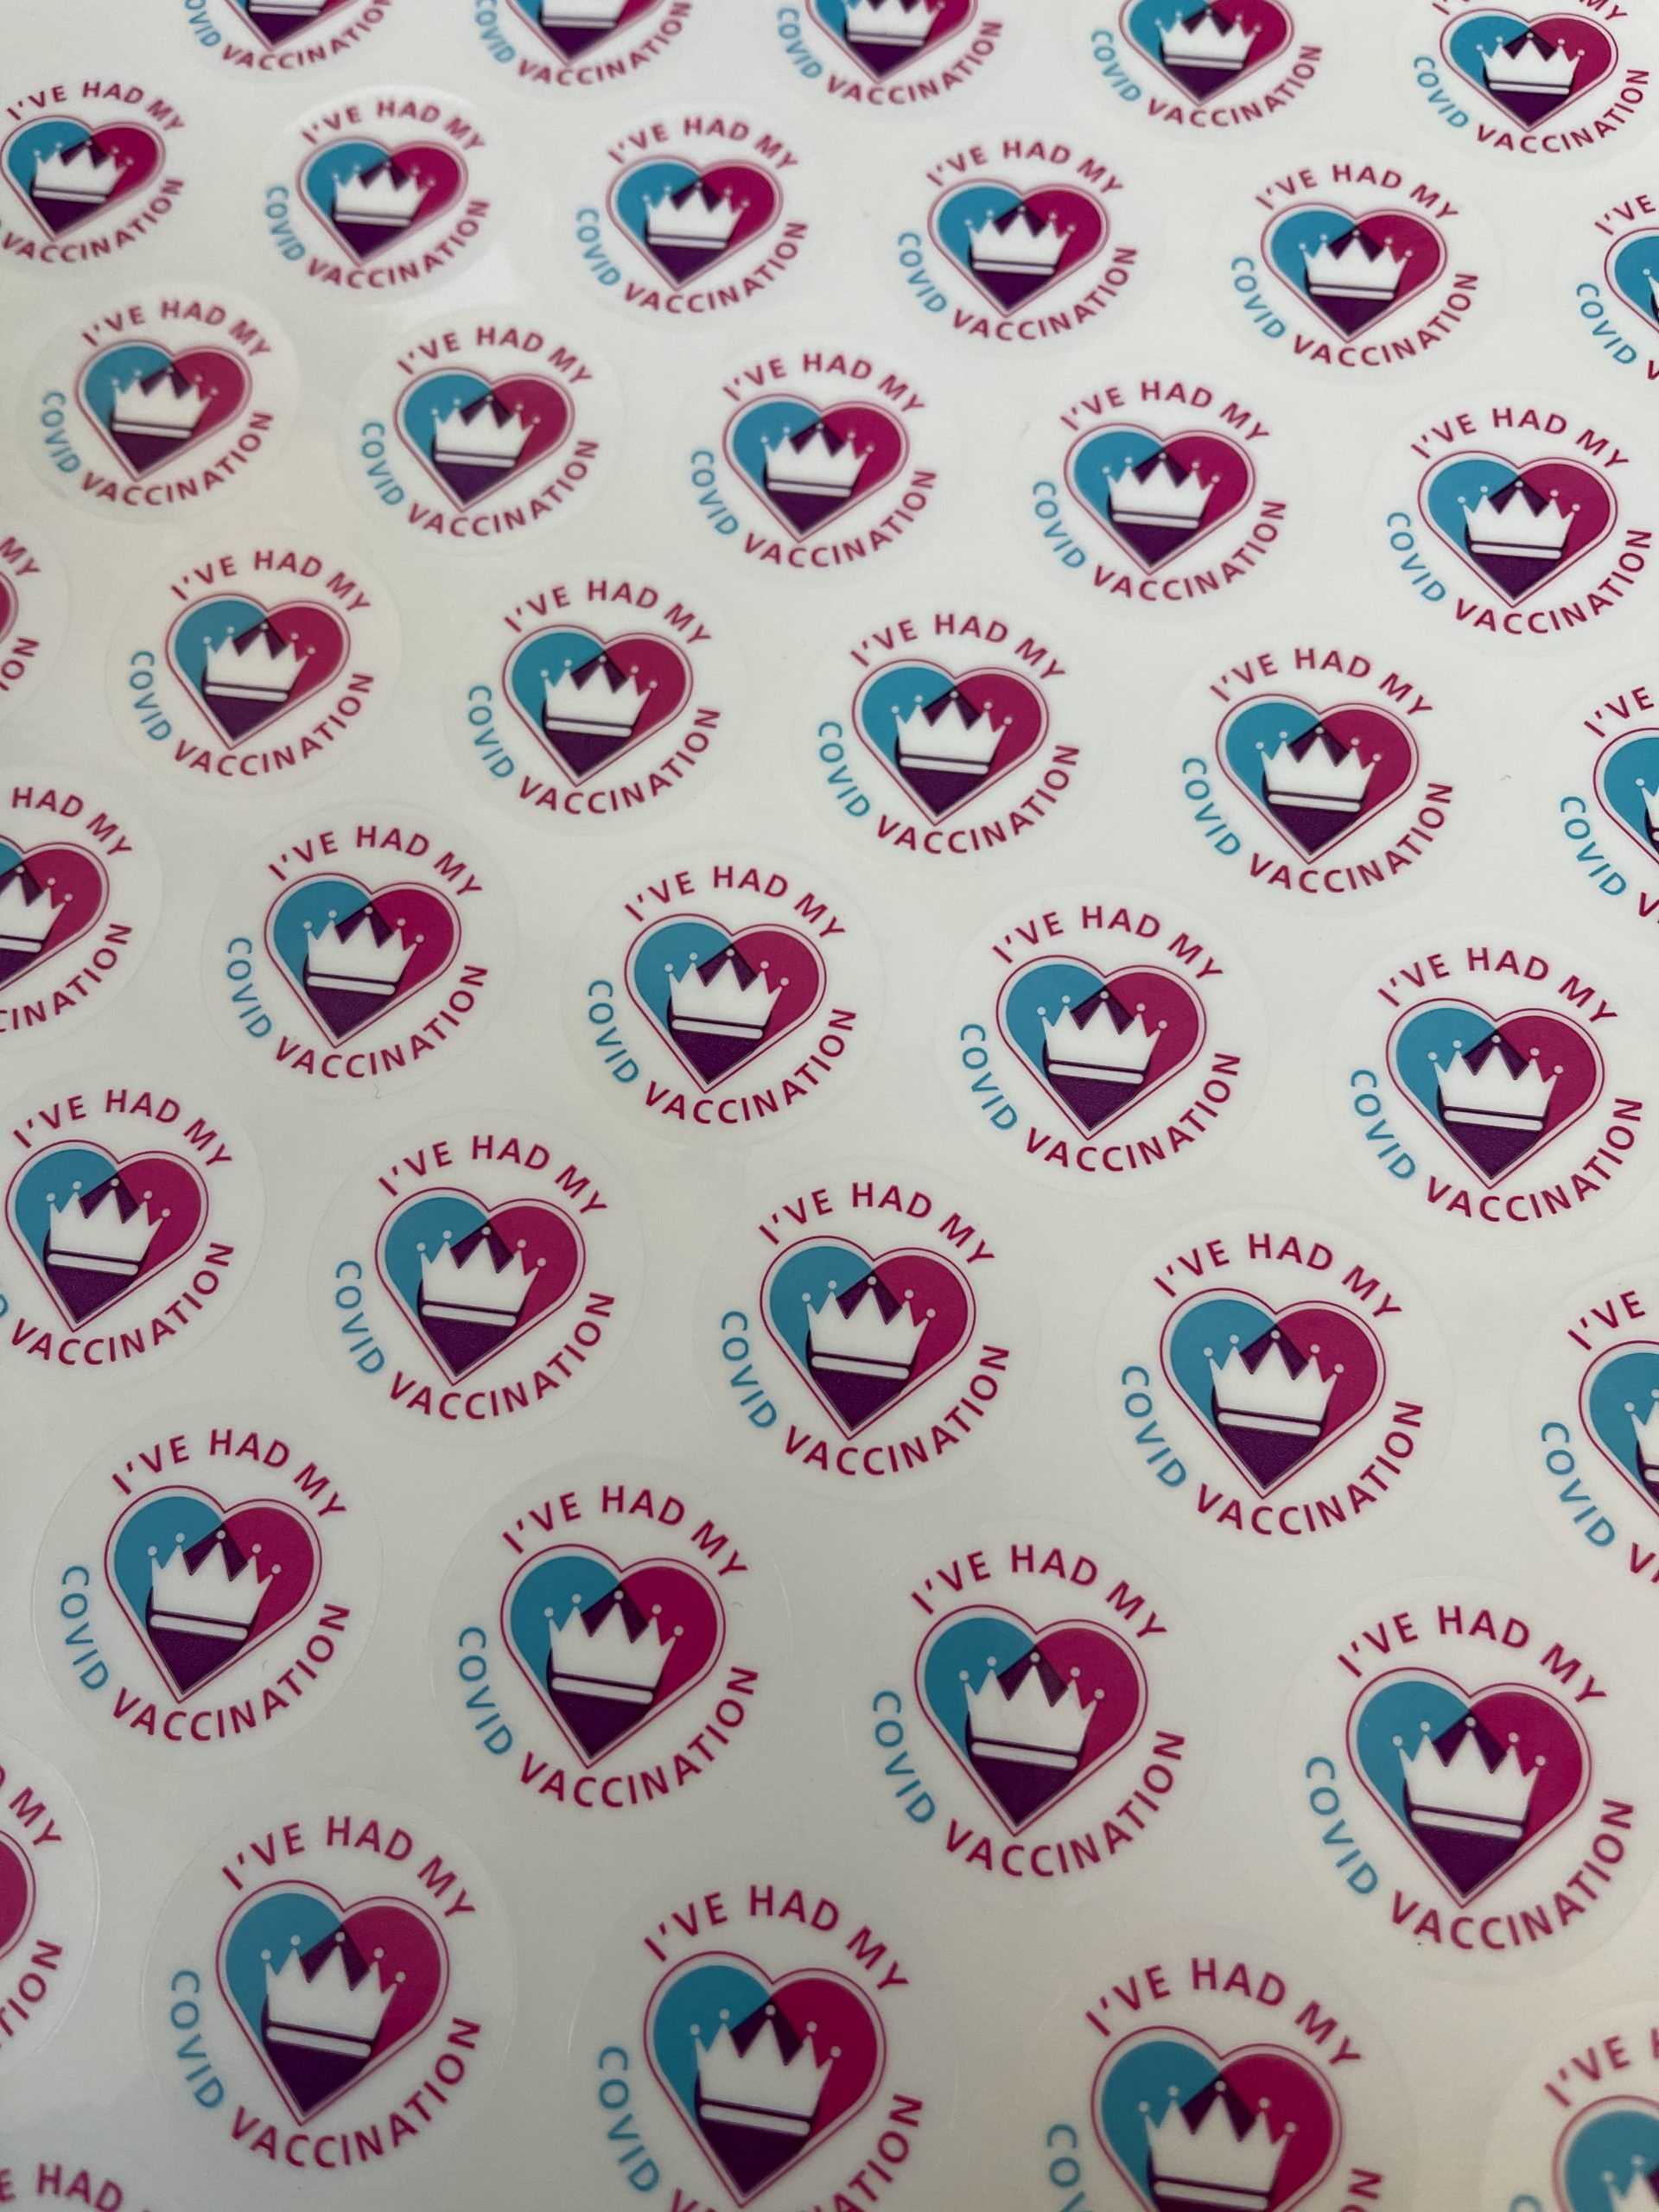 Stickers - Health News Scotland